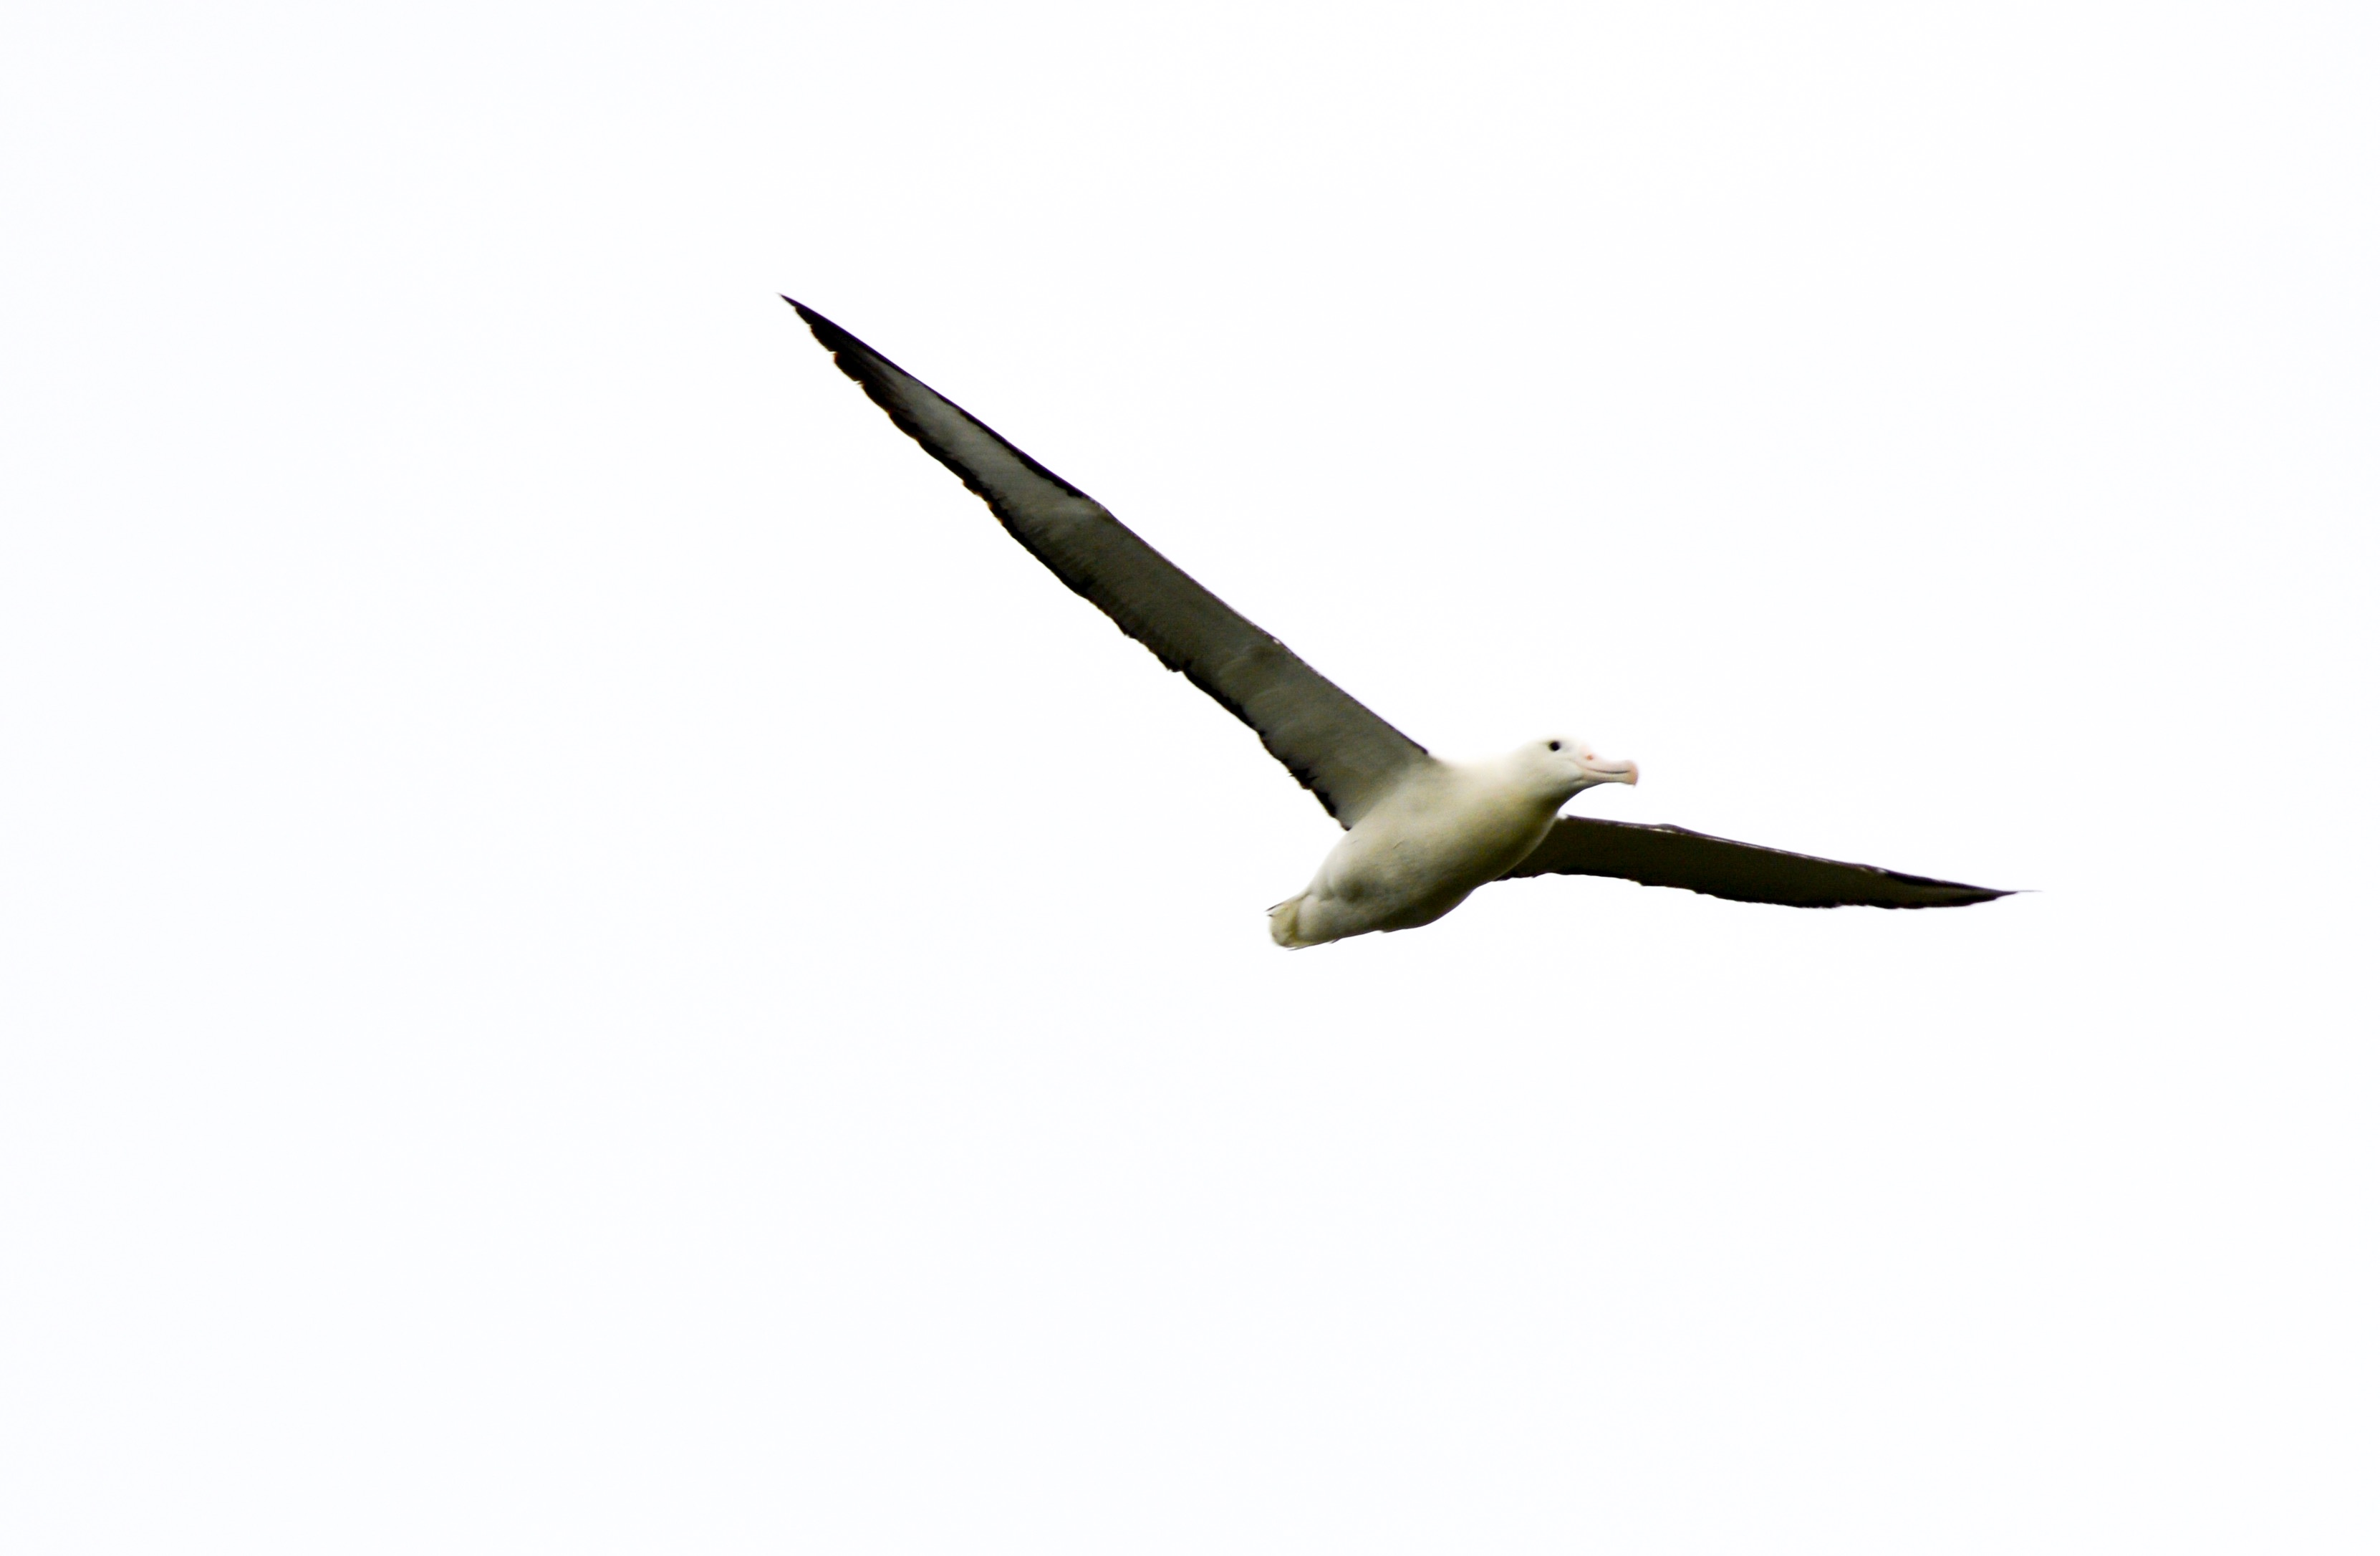 Albatross soaring above Taiaroa head, Otago Peninsula, New Zealand